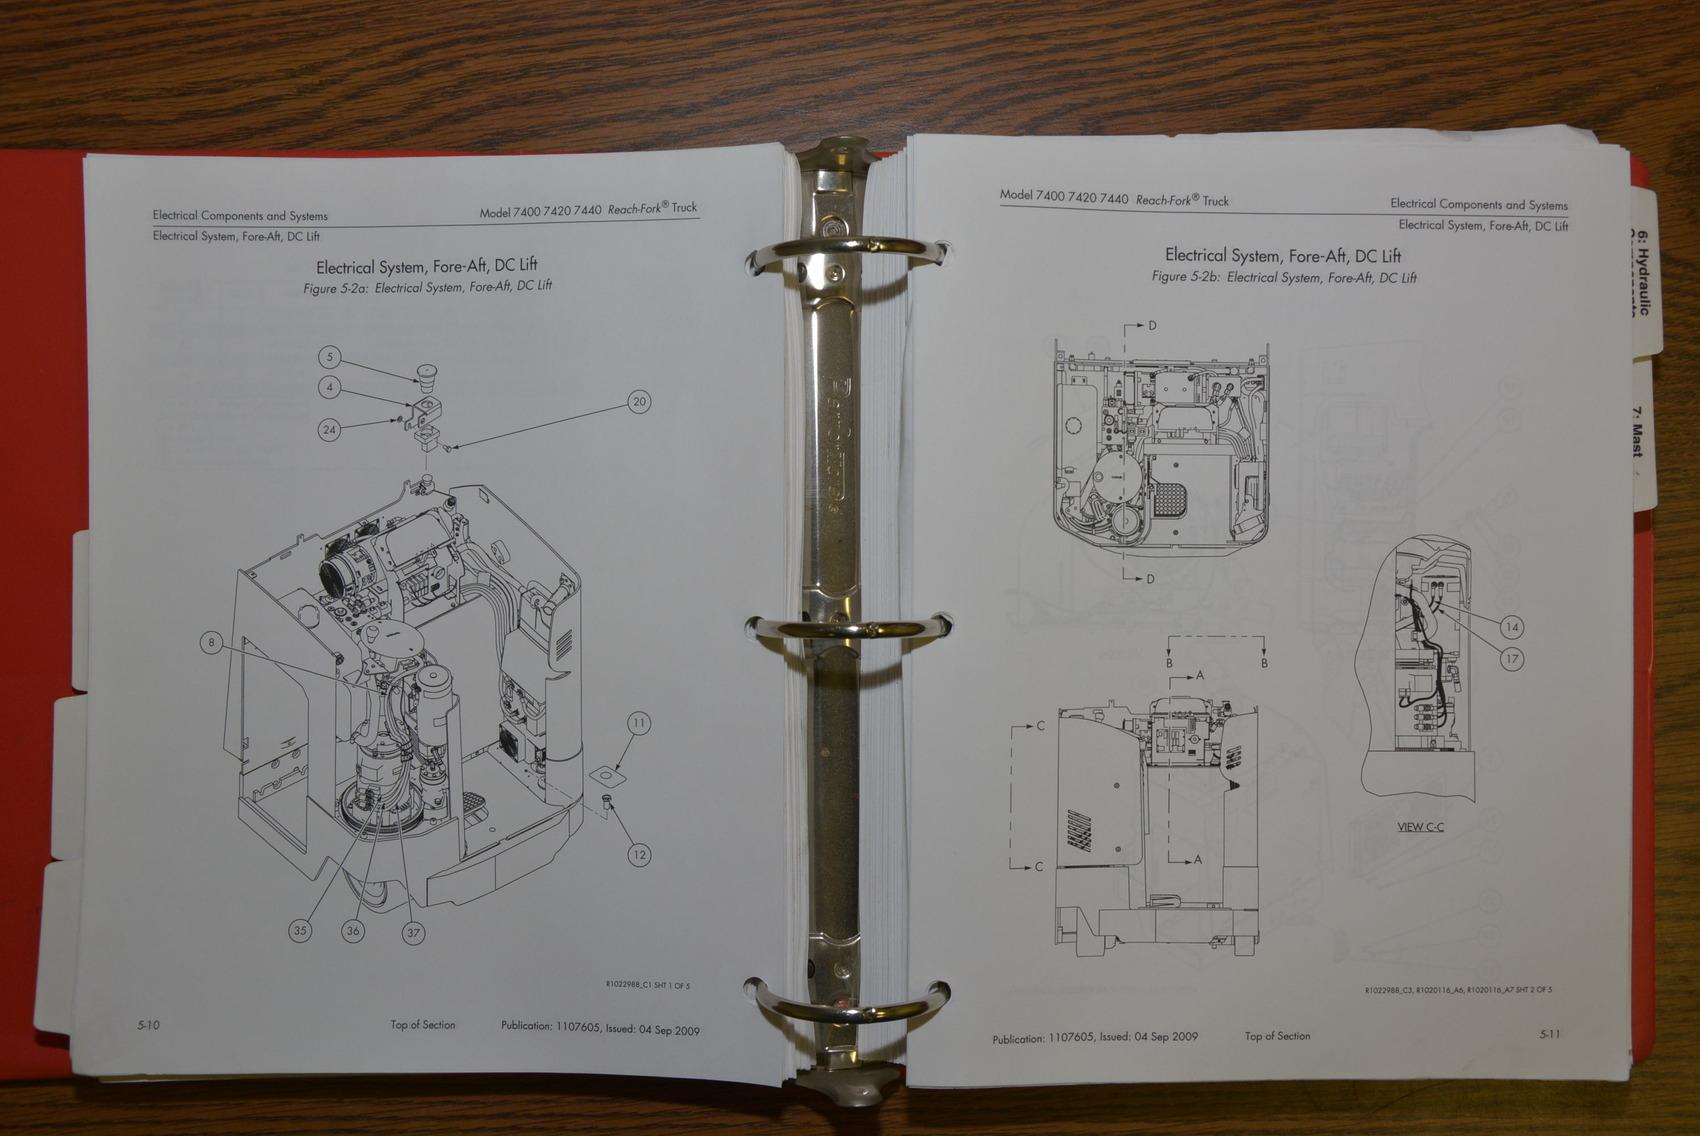 Raymond Reach Truck Manual Related Keywords & Suggestions - Raymond